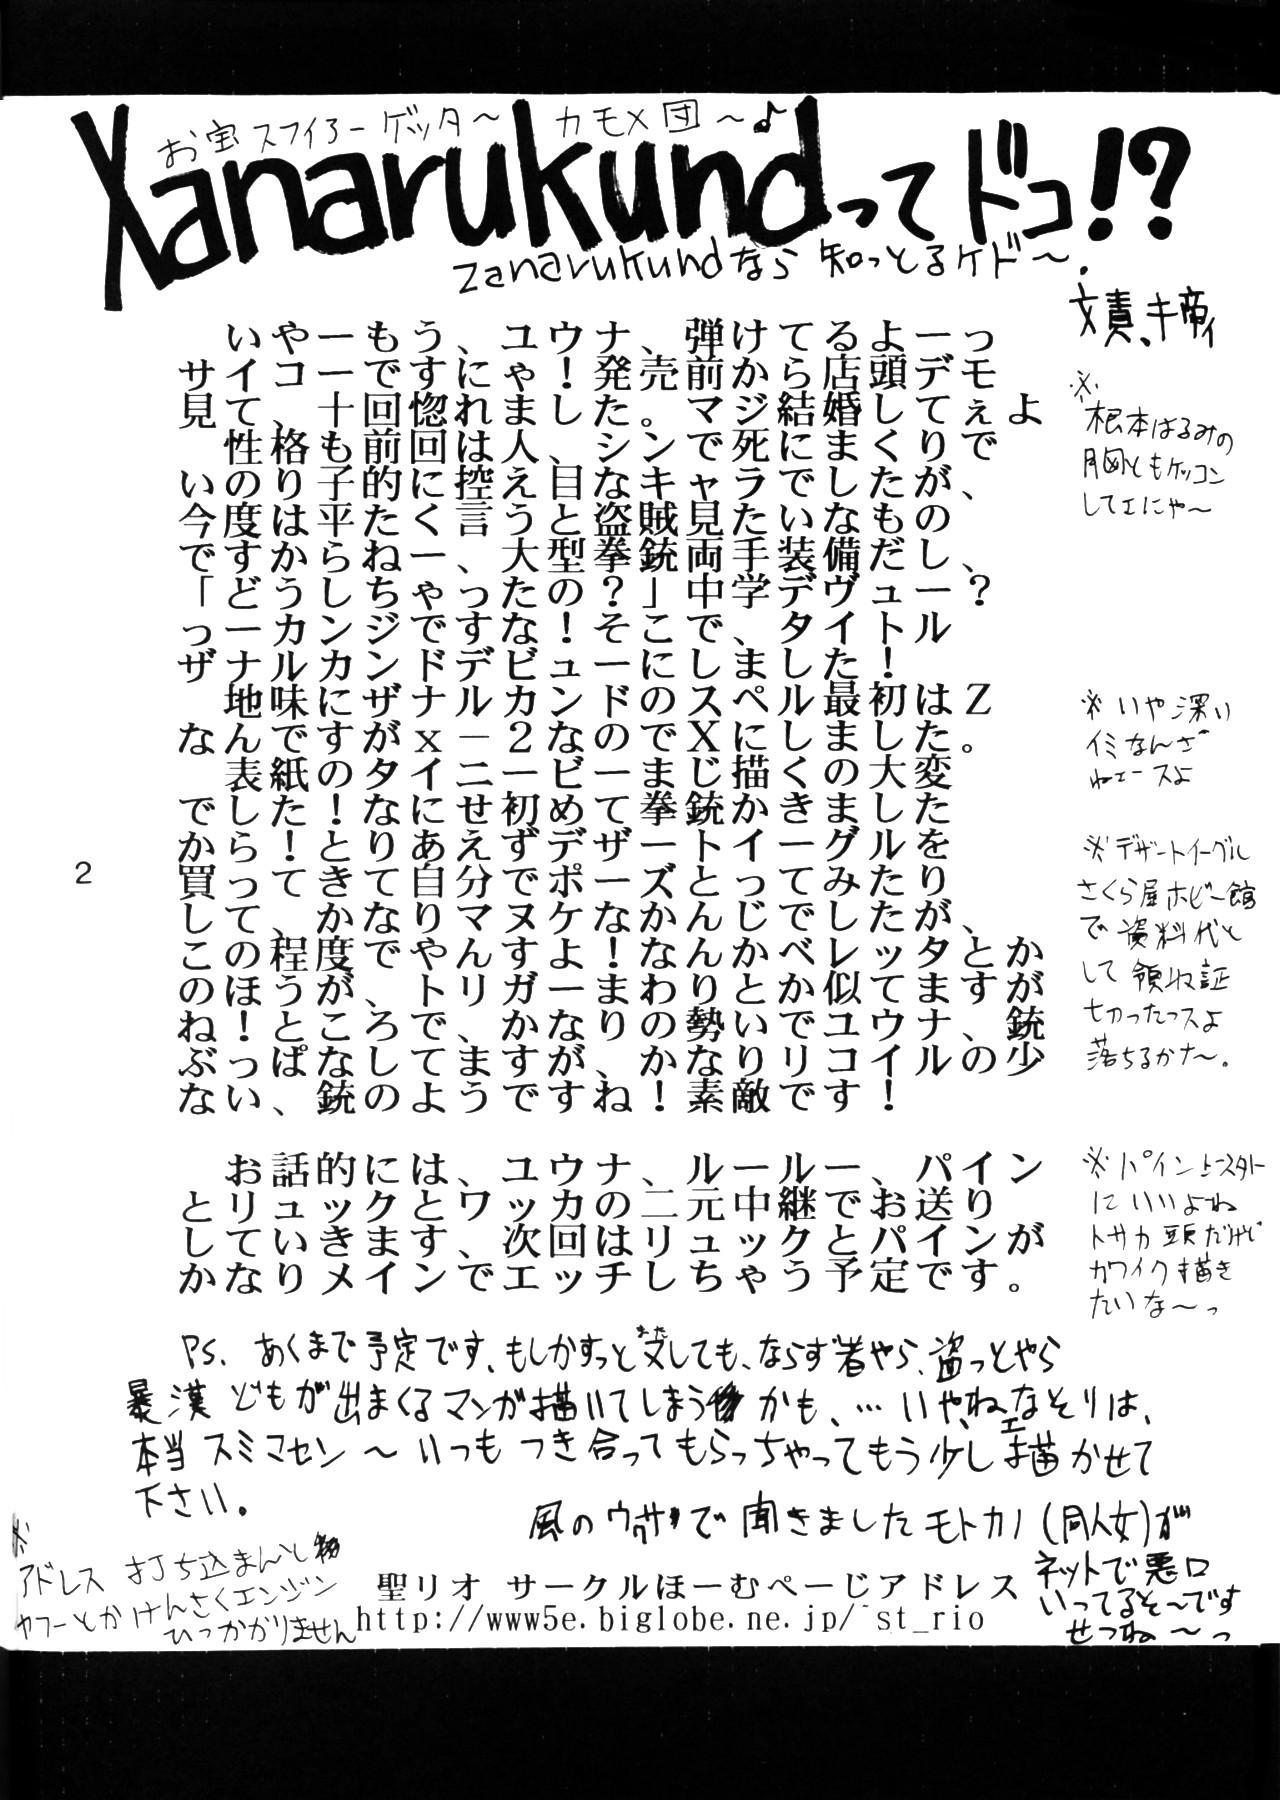 Yuna A La Mode 5 Sphere Hunter Kamomedan XANARKAND DEBUT 2